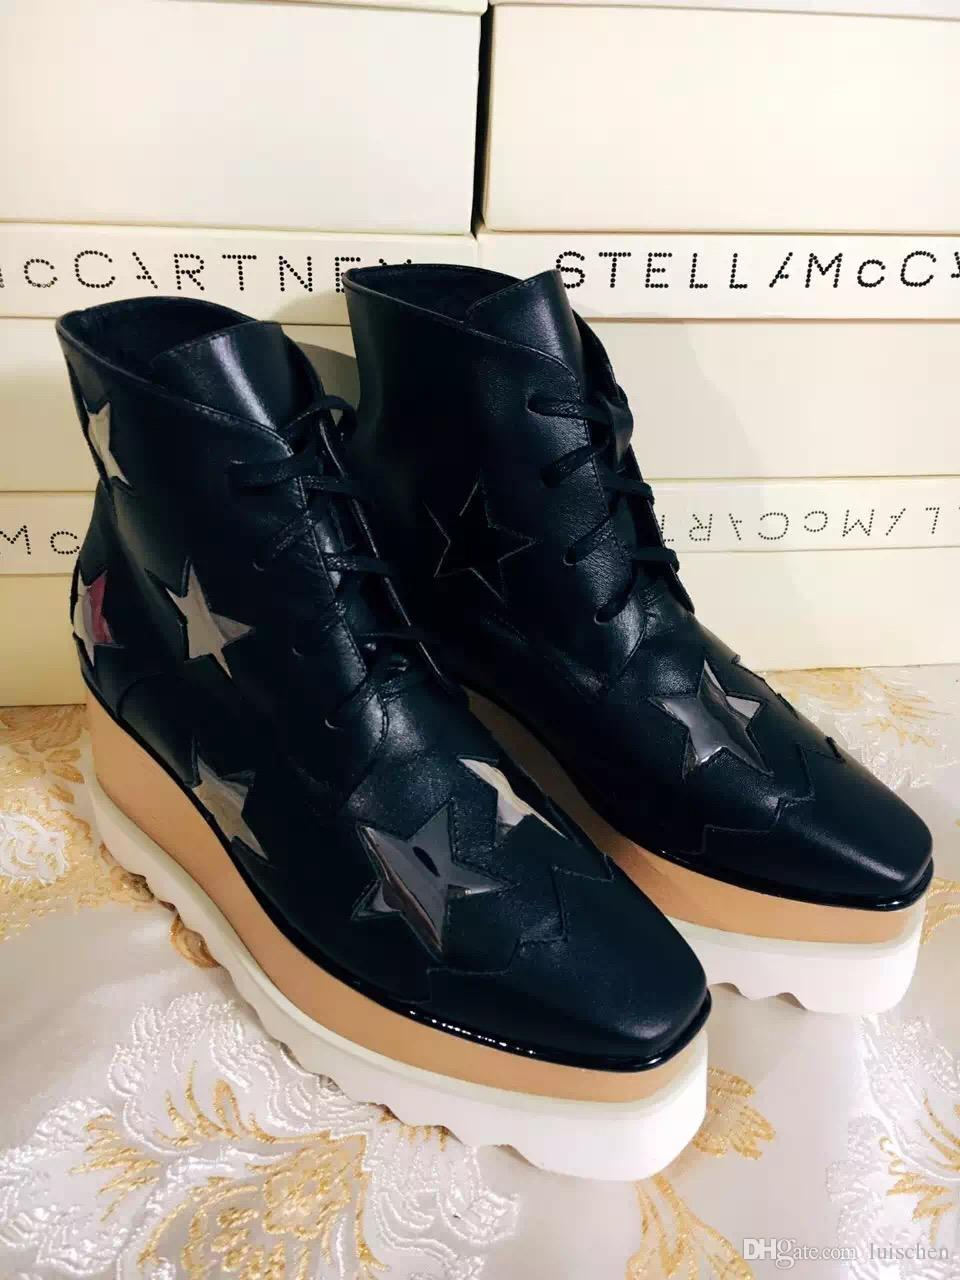 4eb79b7e008 Stella Mccartney Boots Shoes Binx Brogue Platform Elyse Derby Black Genuine  Leather Dark Grey Star White Sole Running Shoes Shoes Online From Luischen